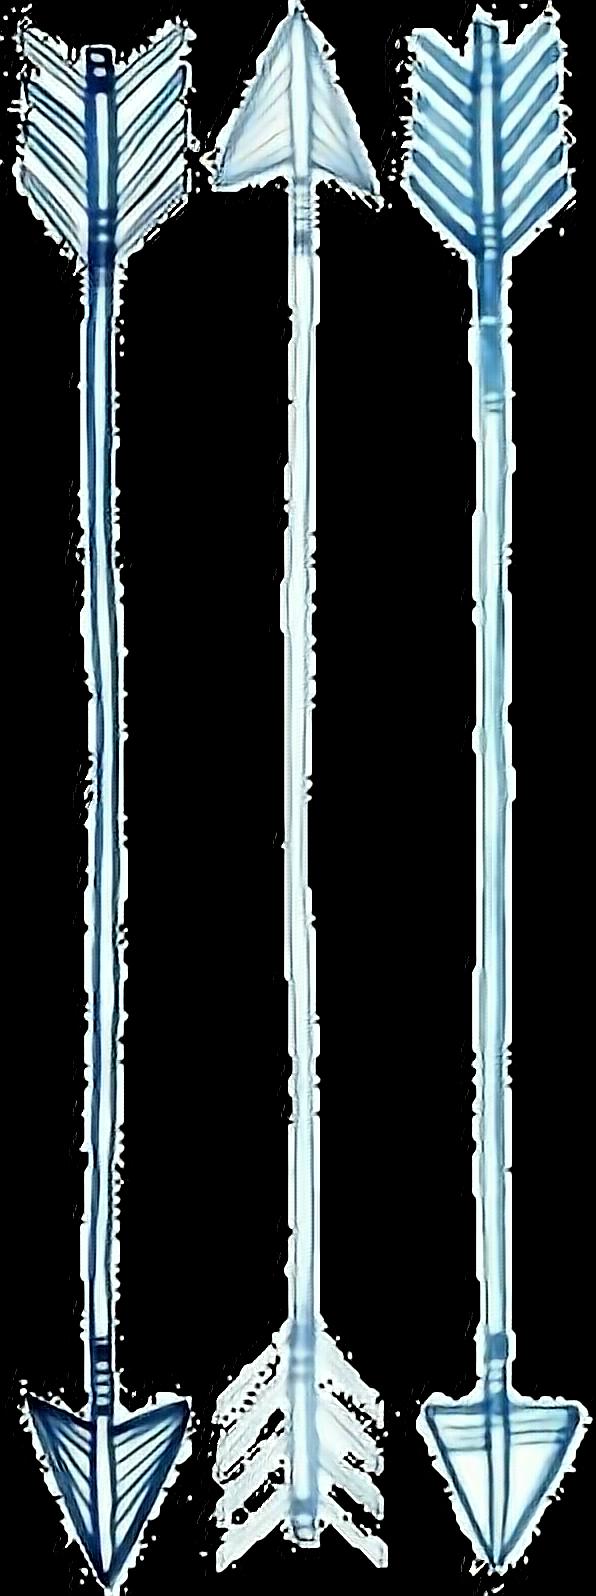 #blue #arrow #arrows #border #divider #tumblr #freetoedit